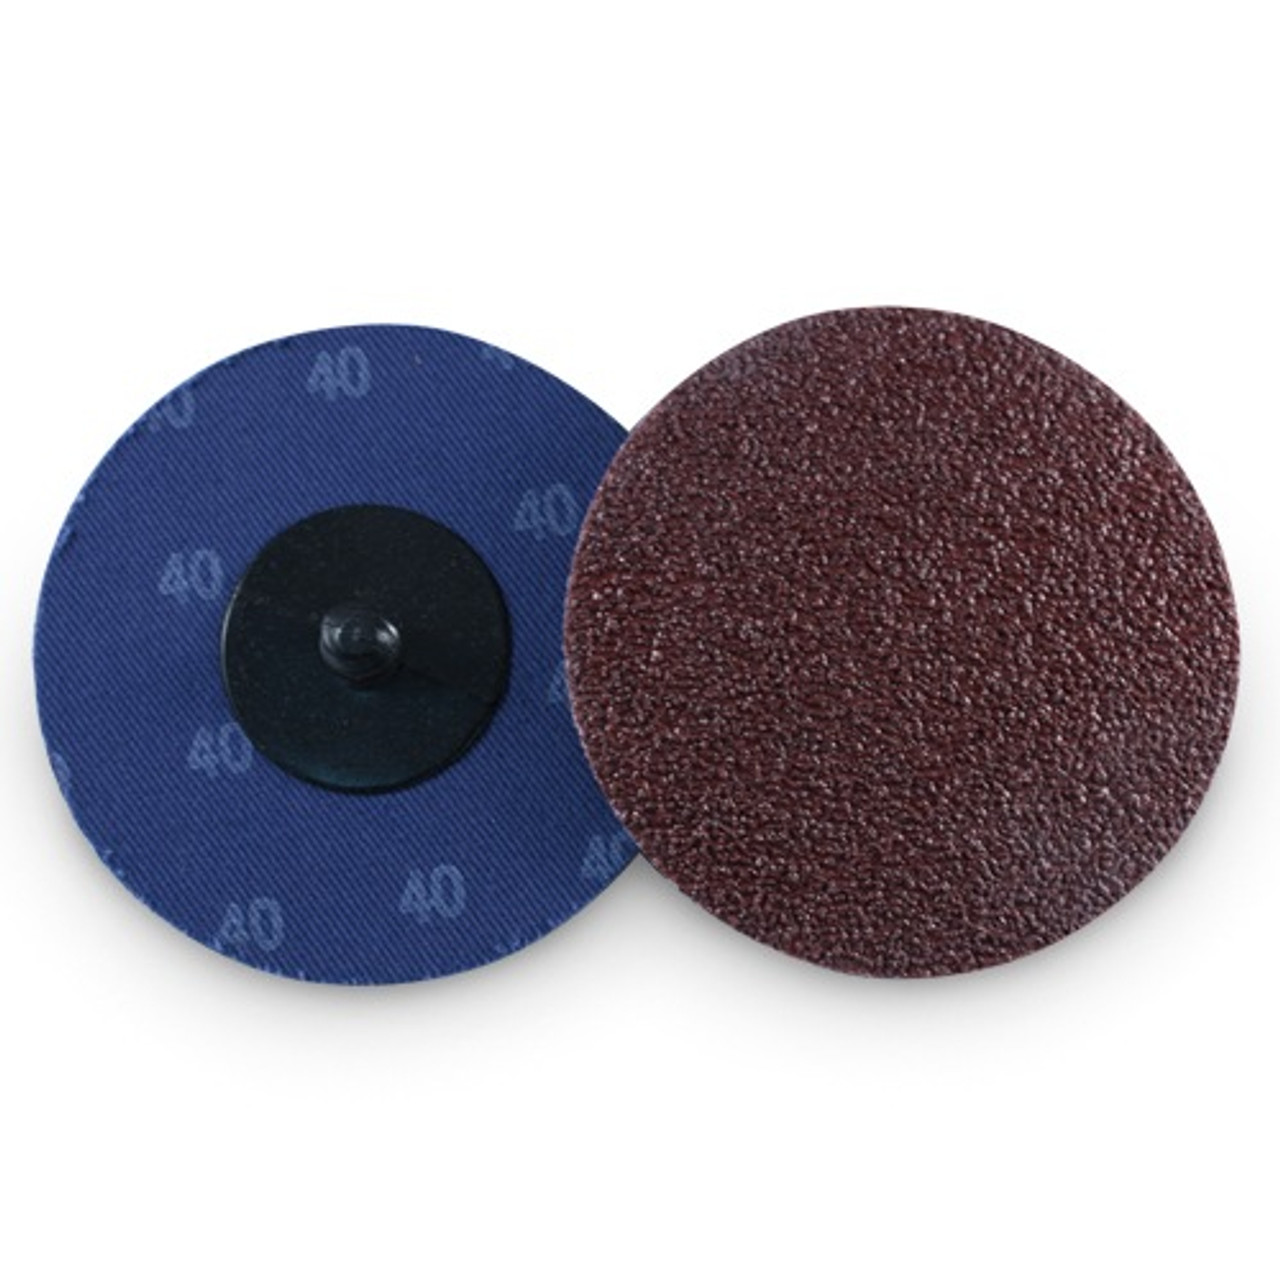 "200-3/"" Roloc A//O Quick Change Sanding Disc 80 Grit and Mandrel"